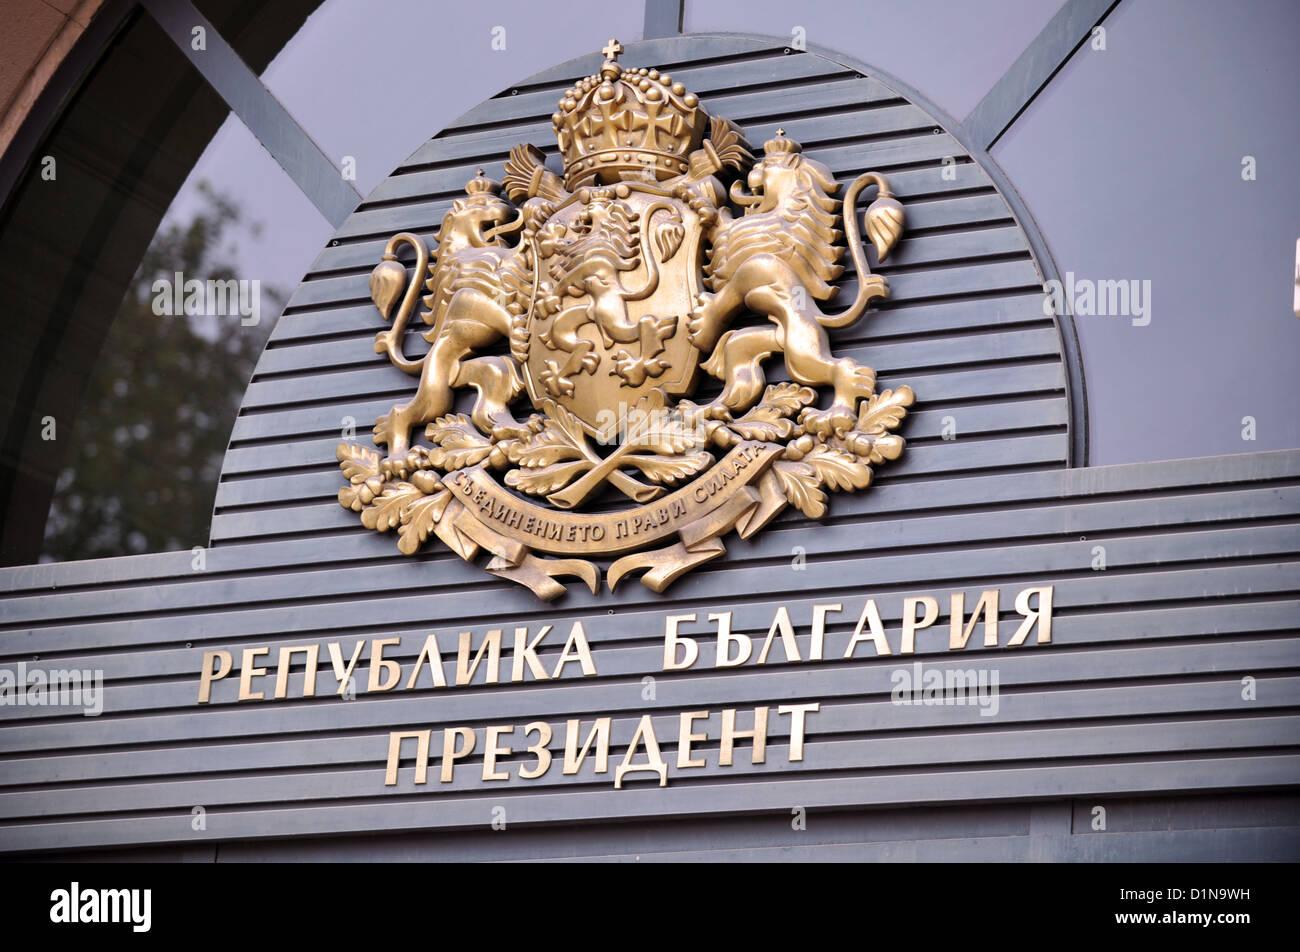 Oficina del Presidente firmar, Sofía, Bulgaria Foto de stock